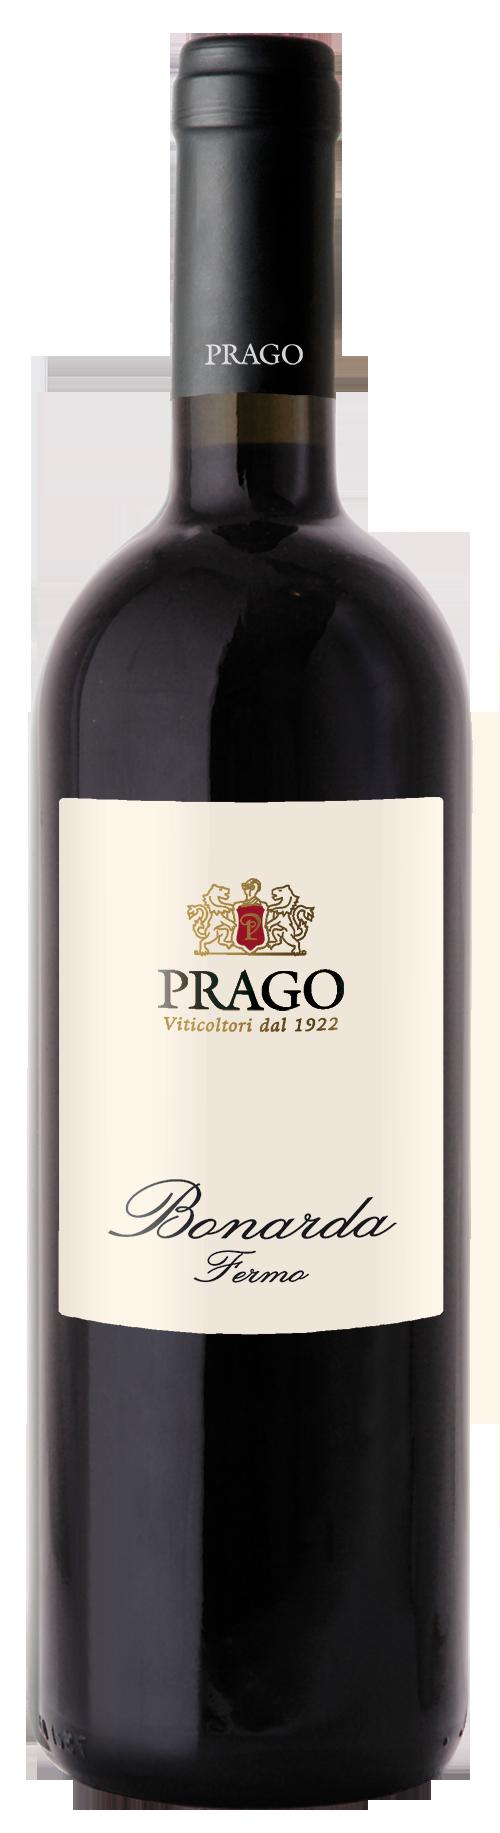 PRAGO Vini e Spumanti Oltrepò Pavese - Vini Fermi - Bonarda